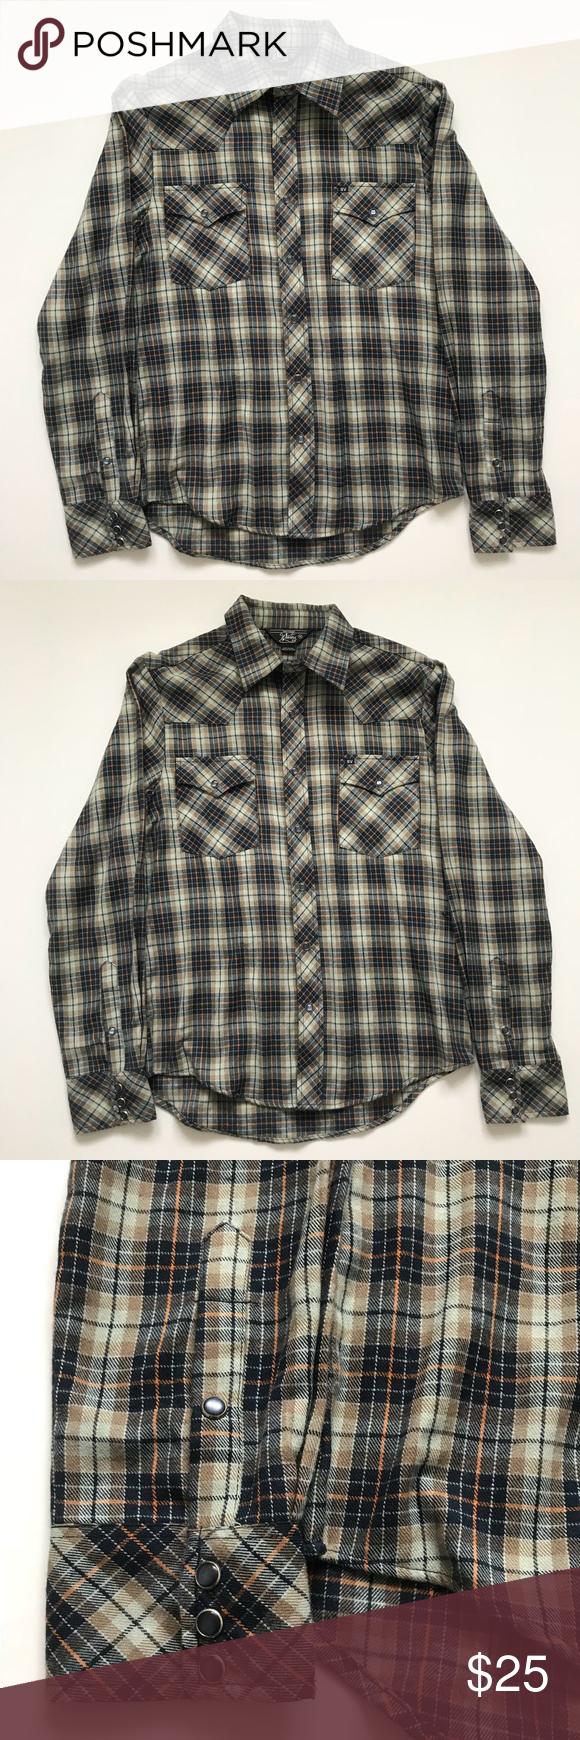 Orange flannel jacket  Urban outfitters Salt Valley Western Plaid Flannel  Flannel shirts